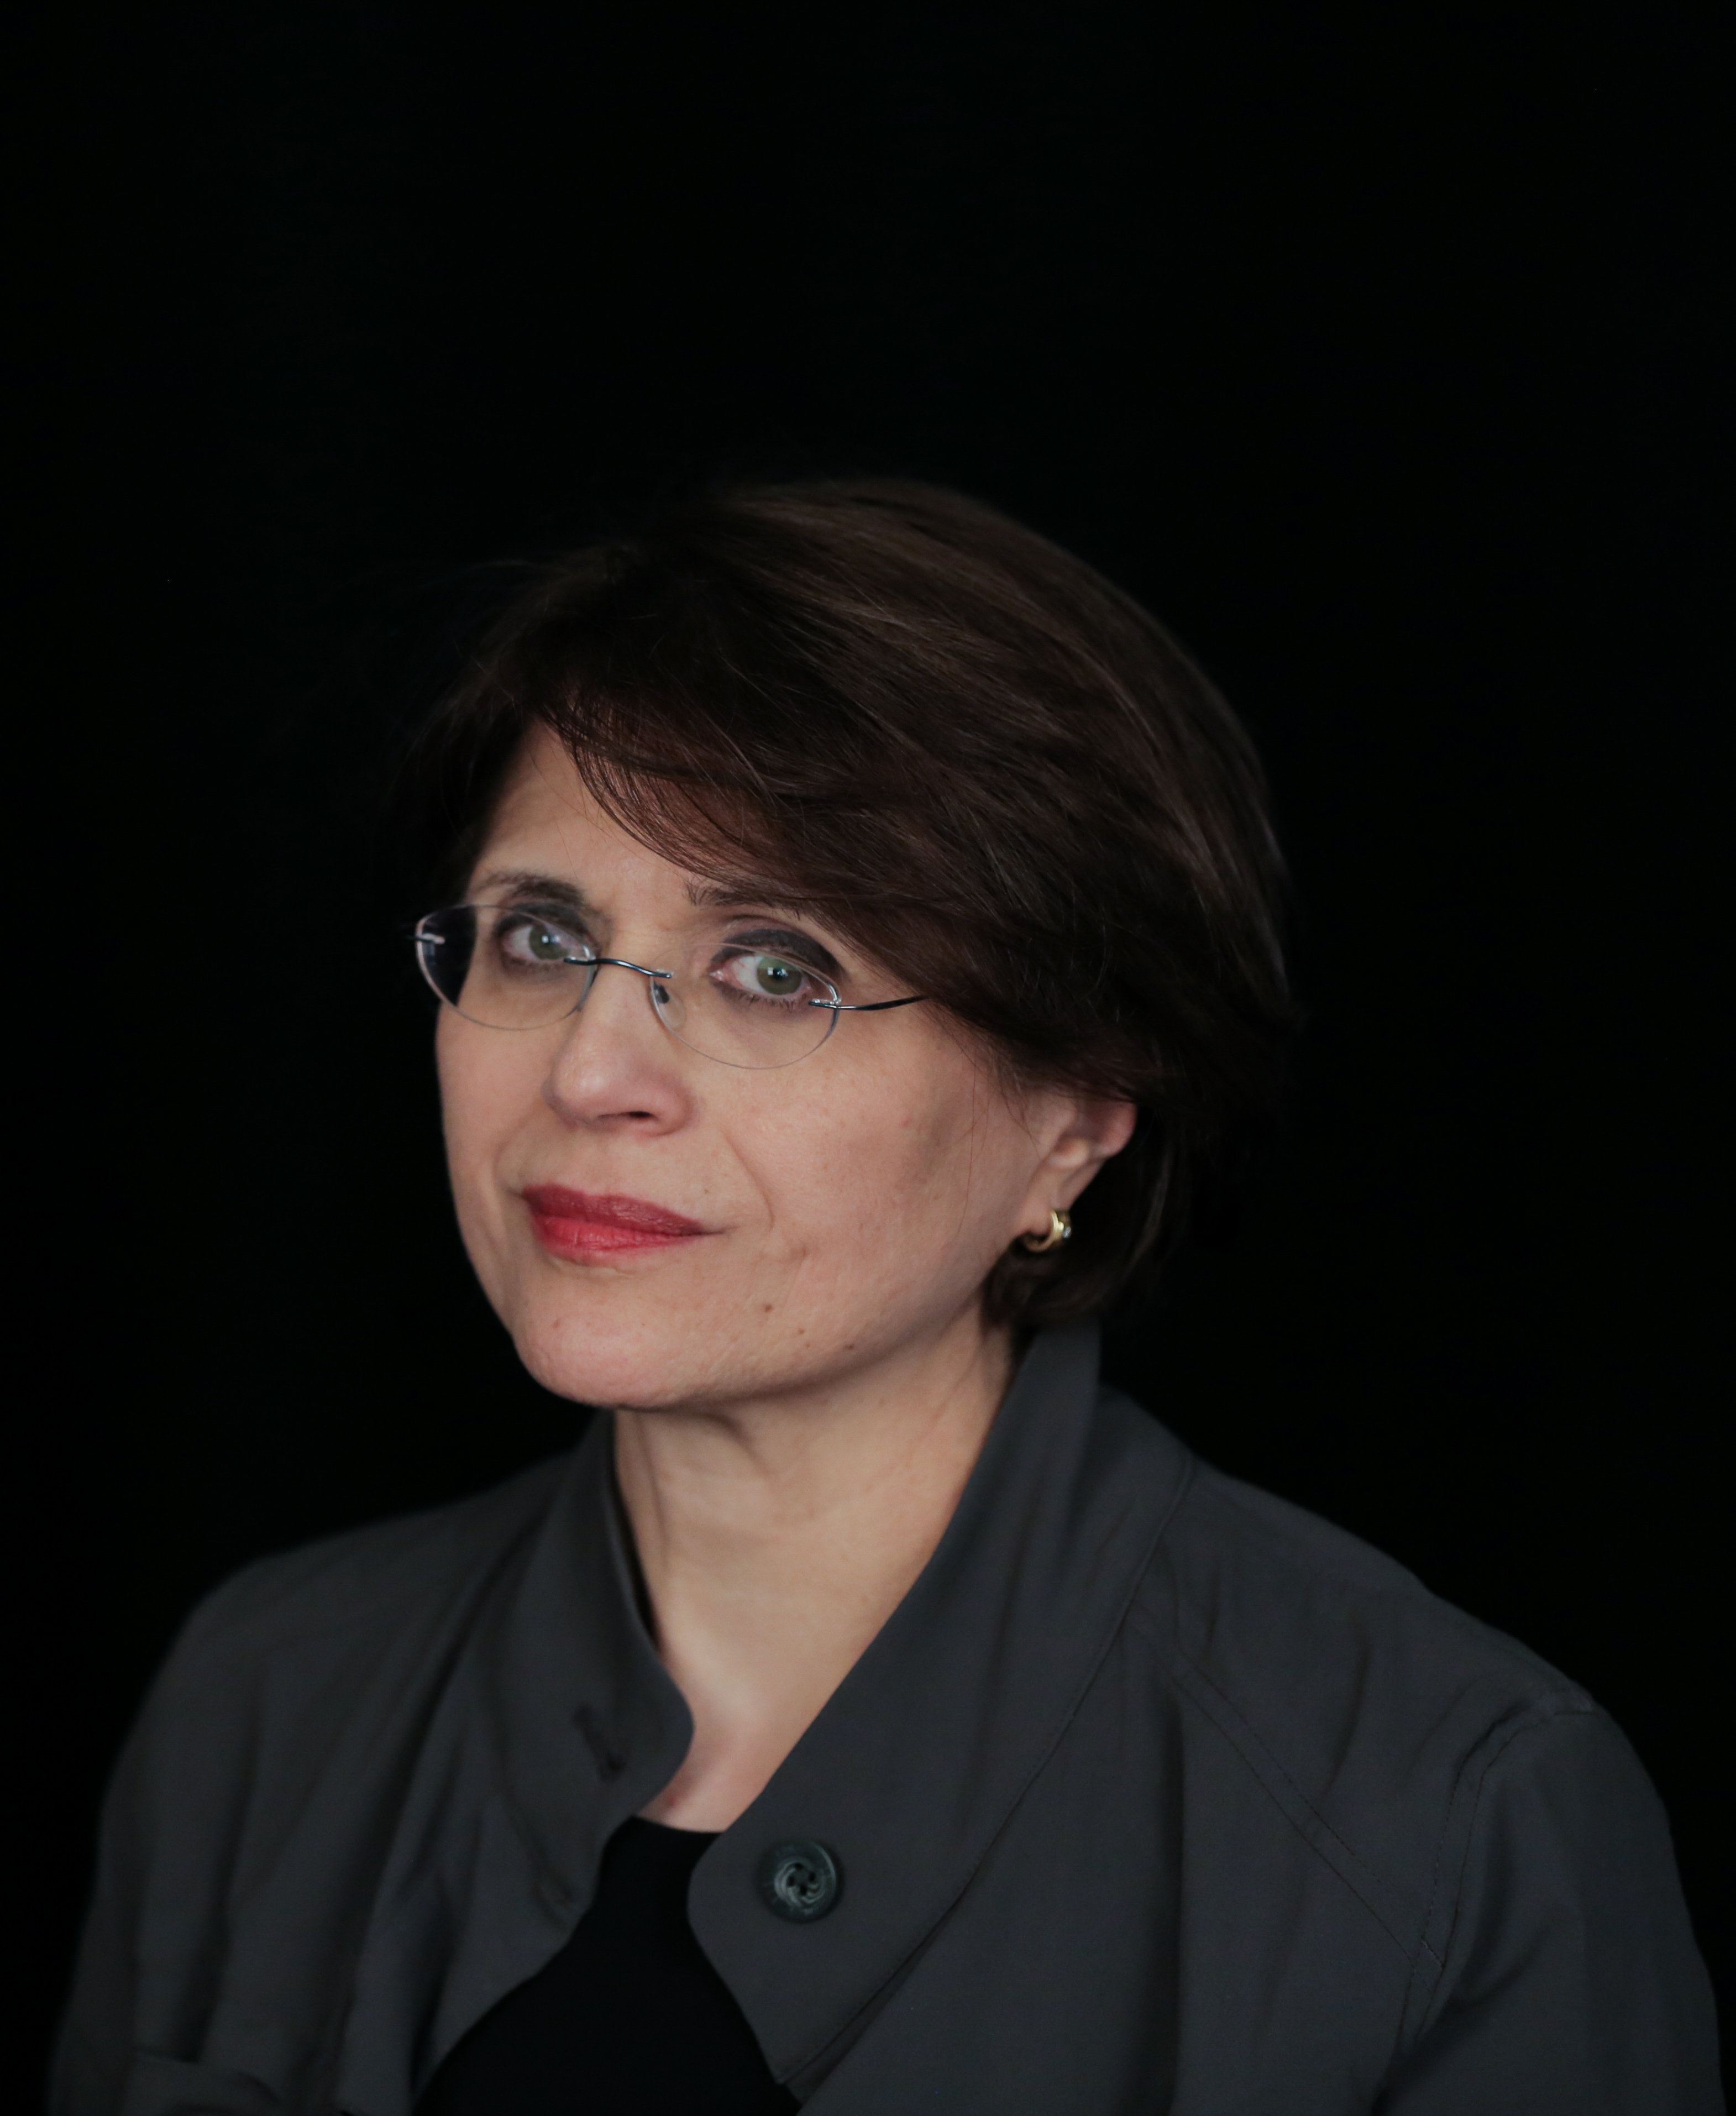 Shadi Nazarian